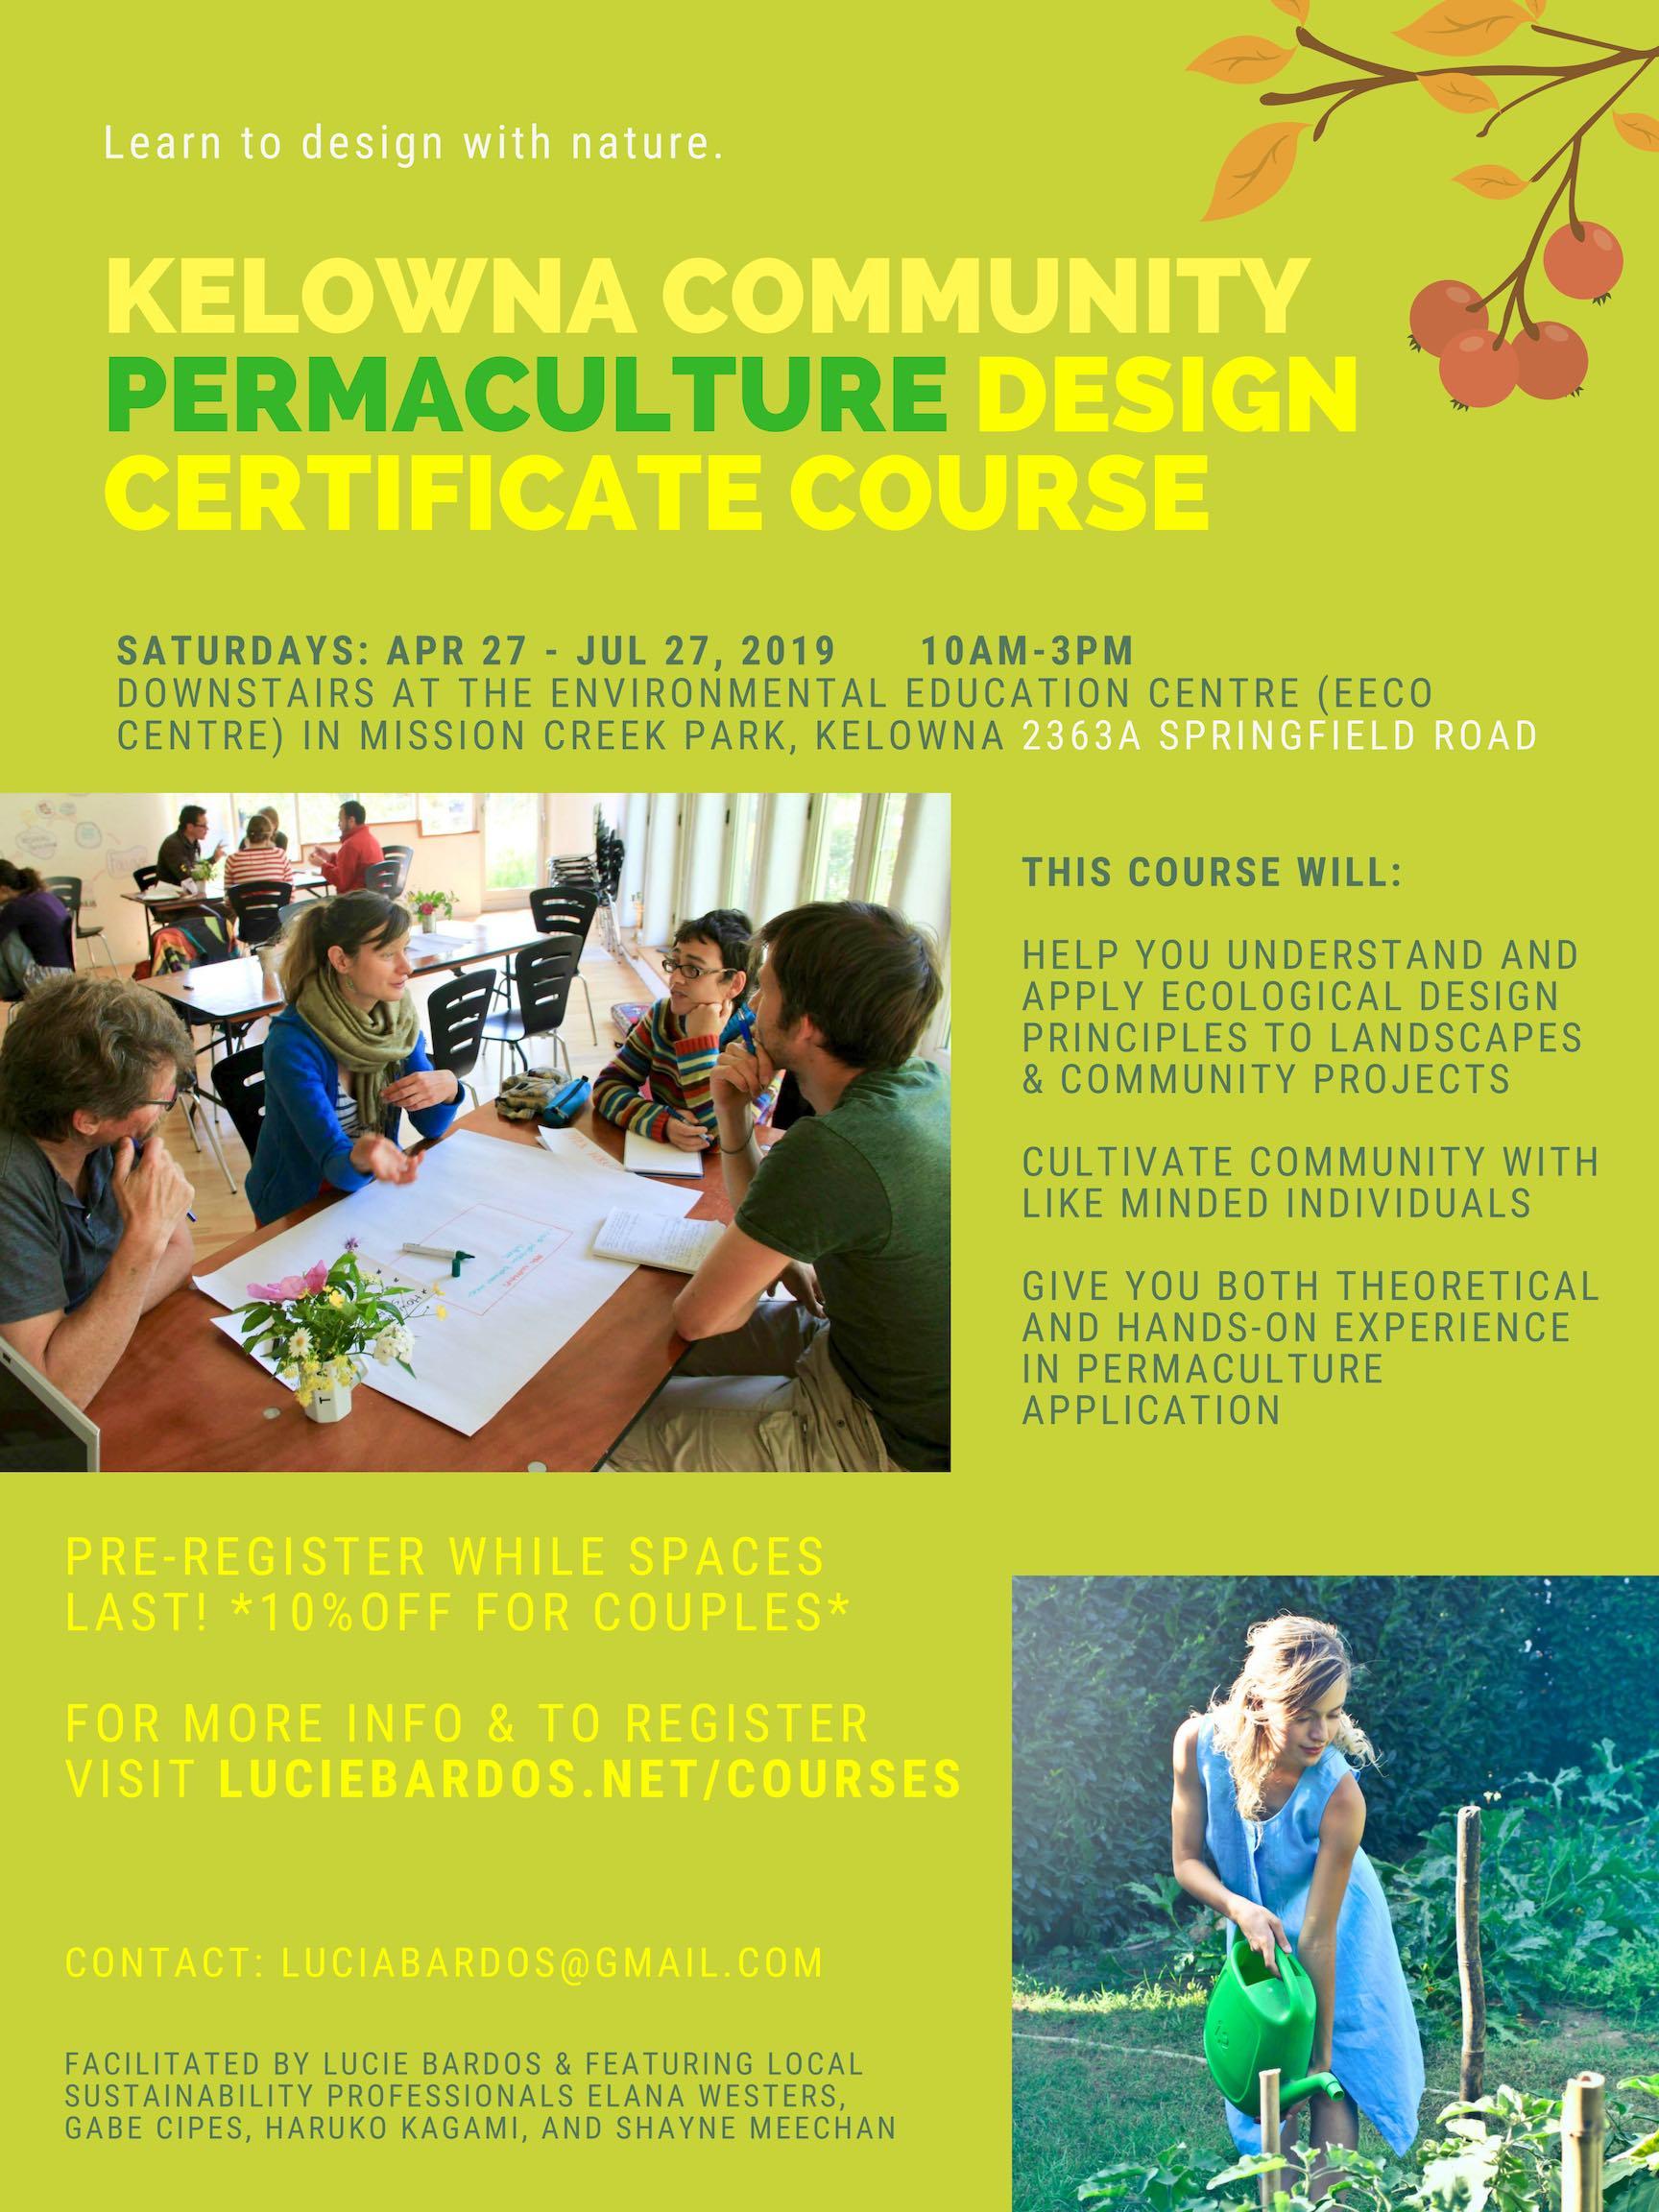 kelowna community permaculture design certificate course